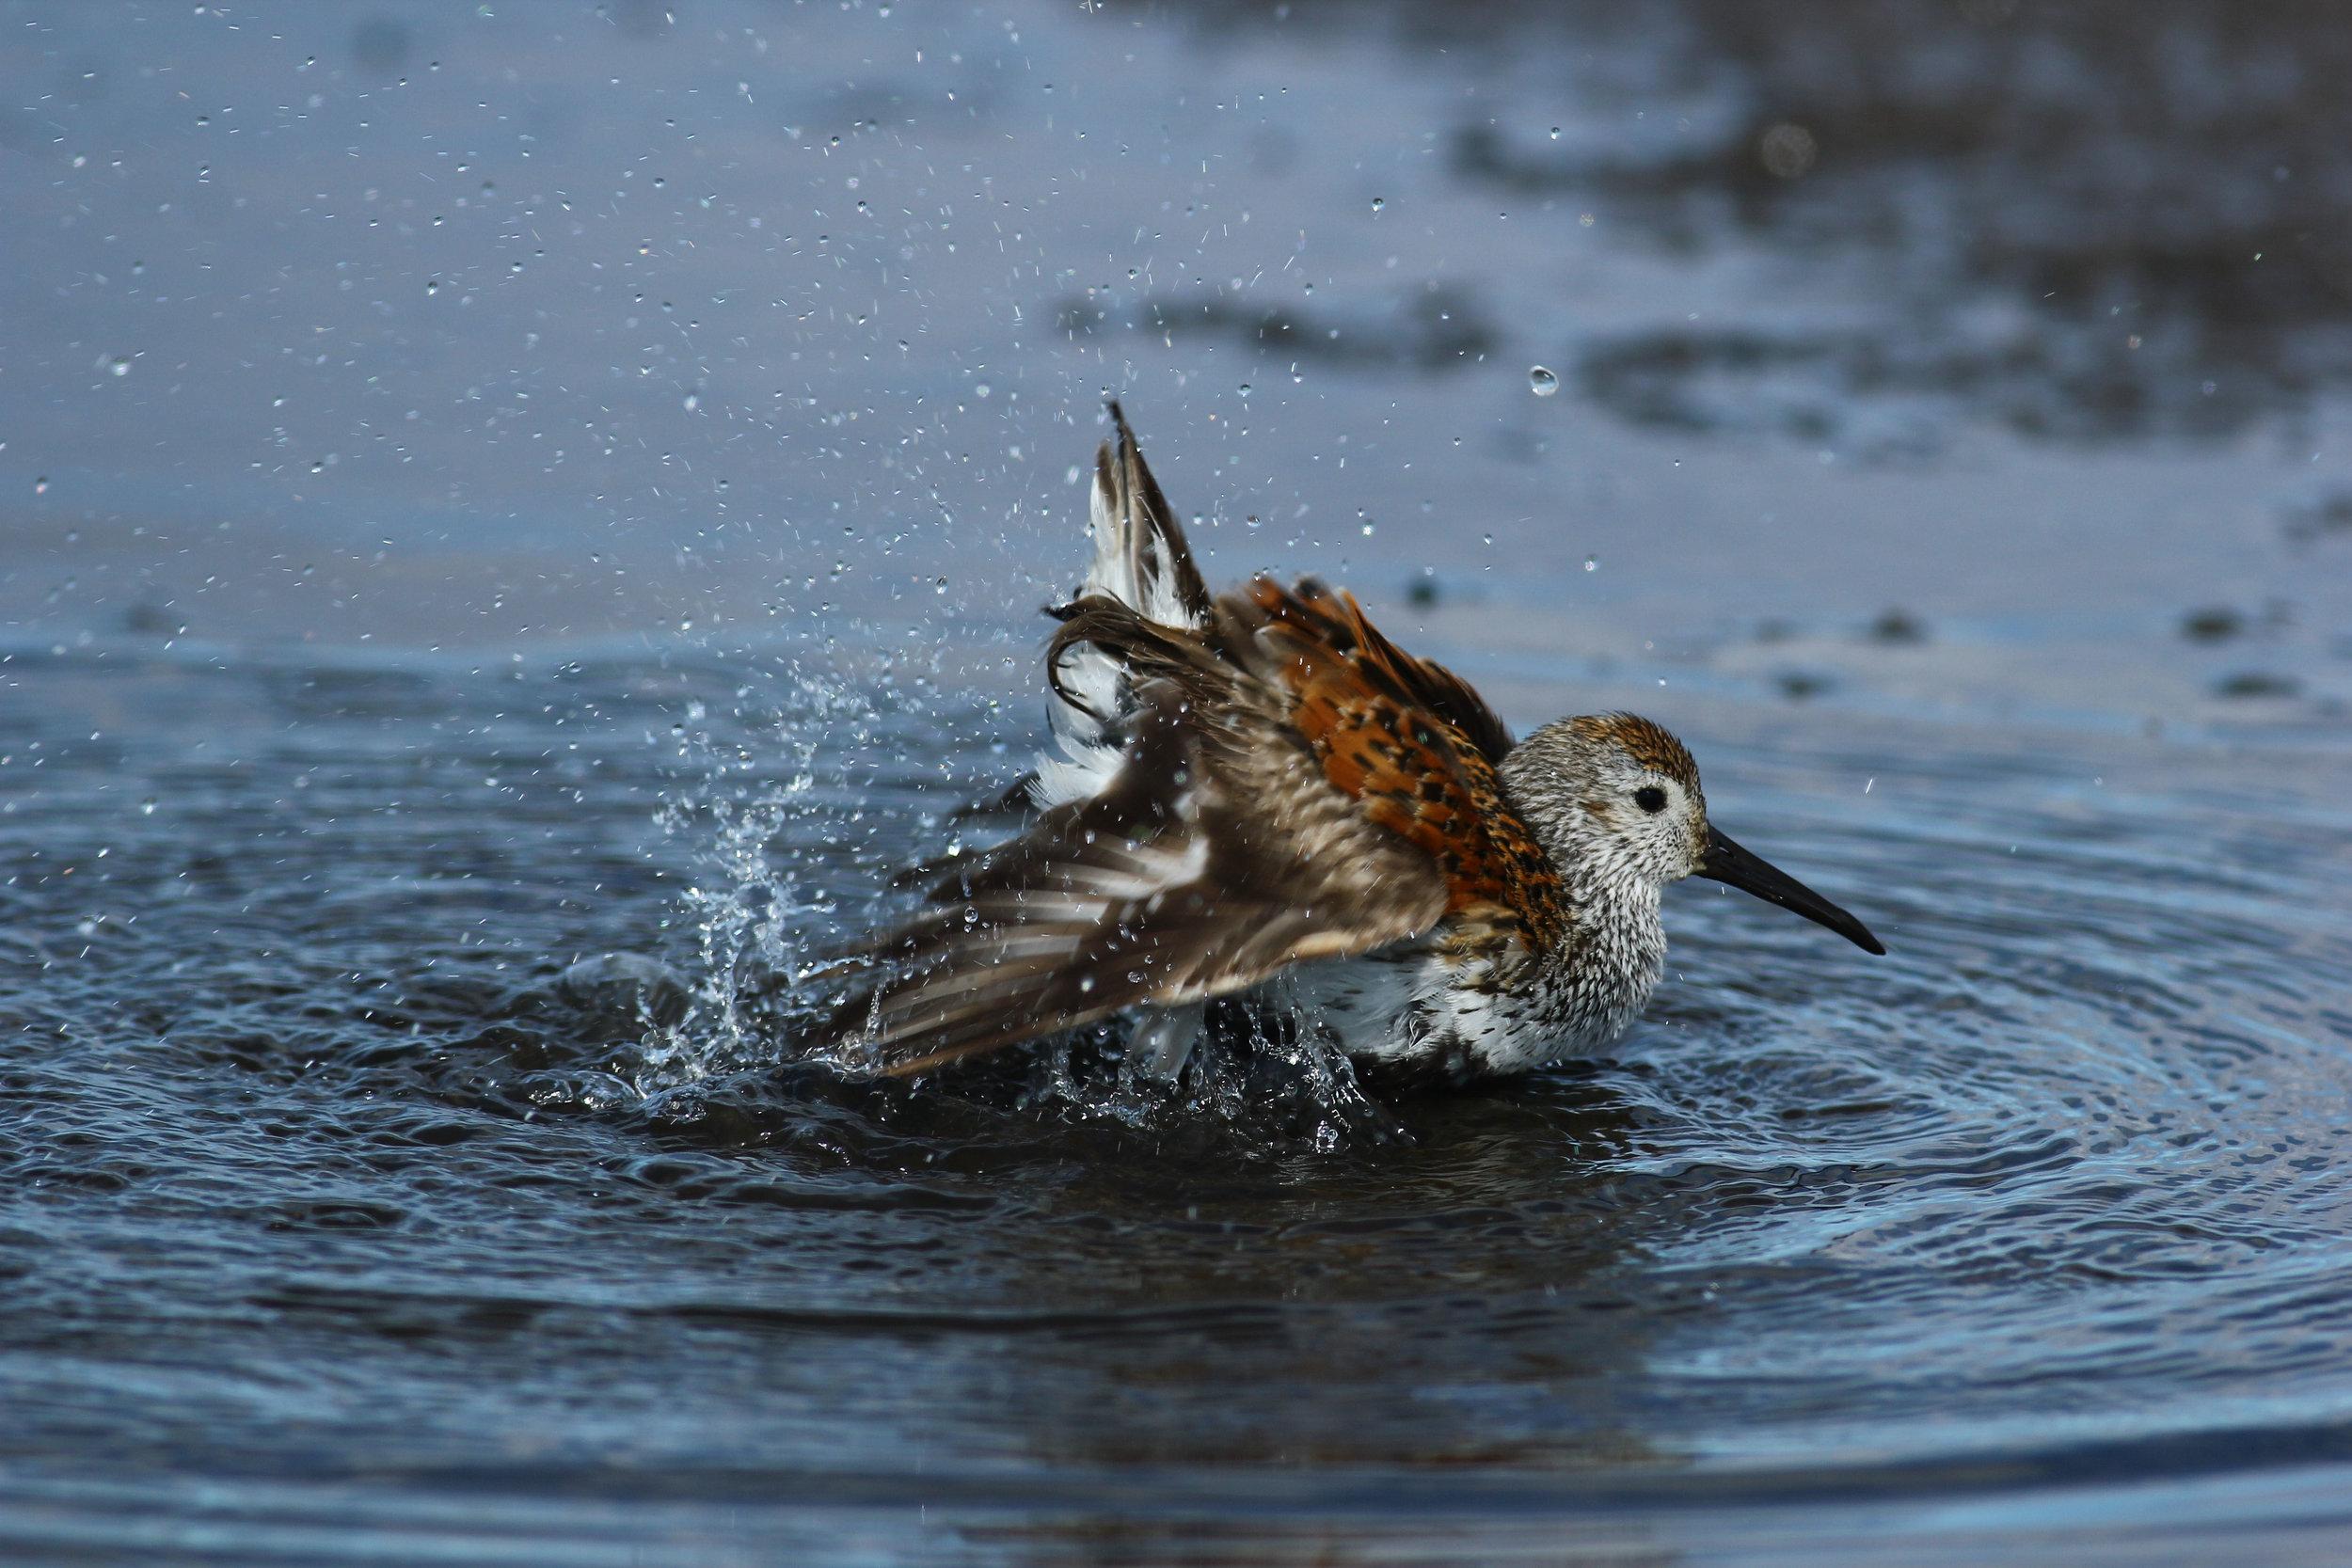 Splashing dunlin